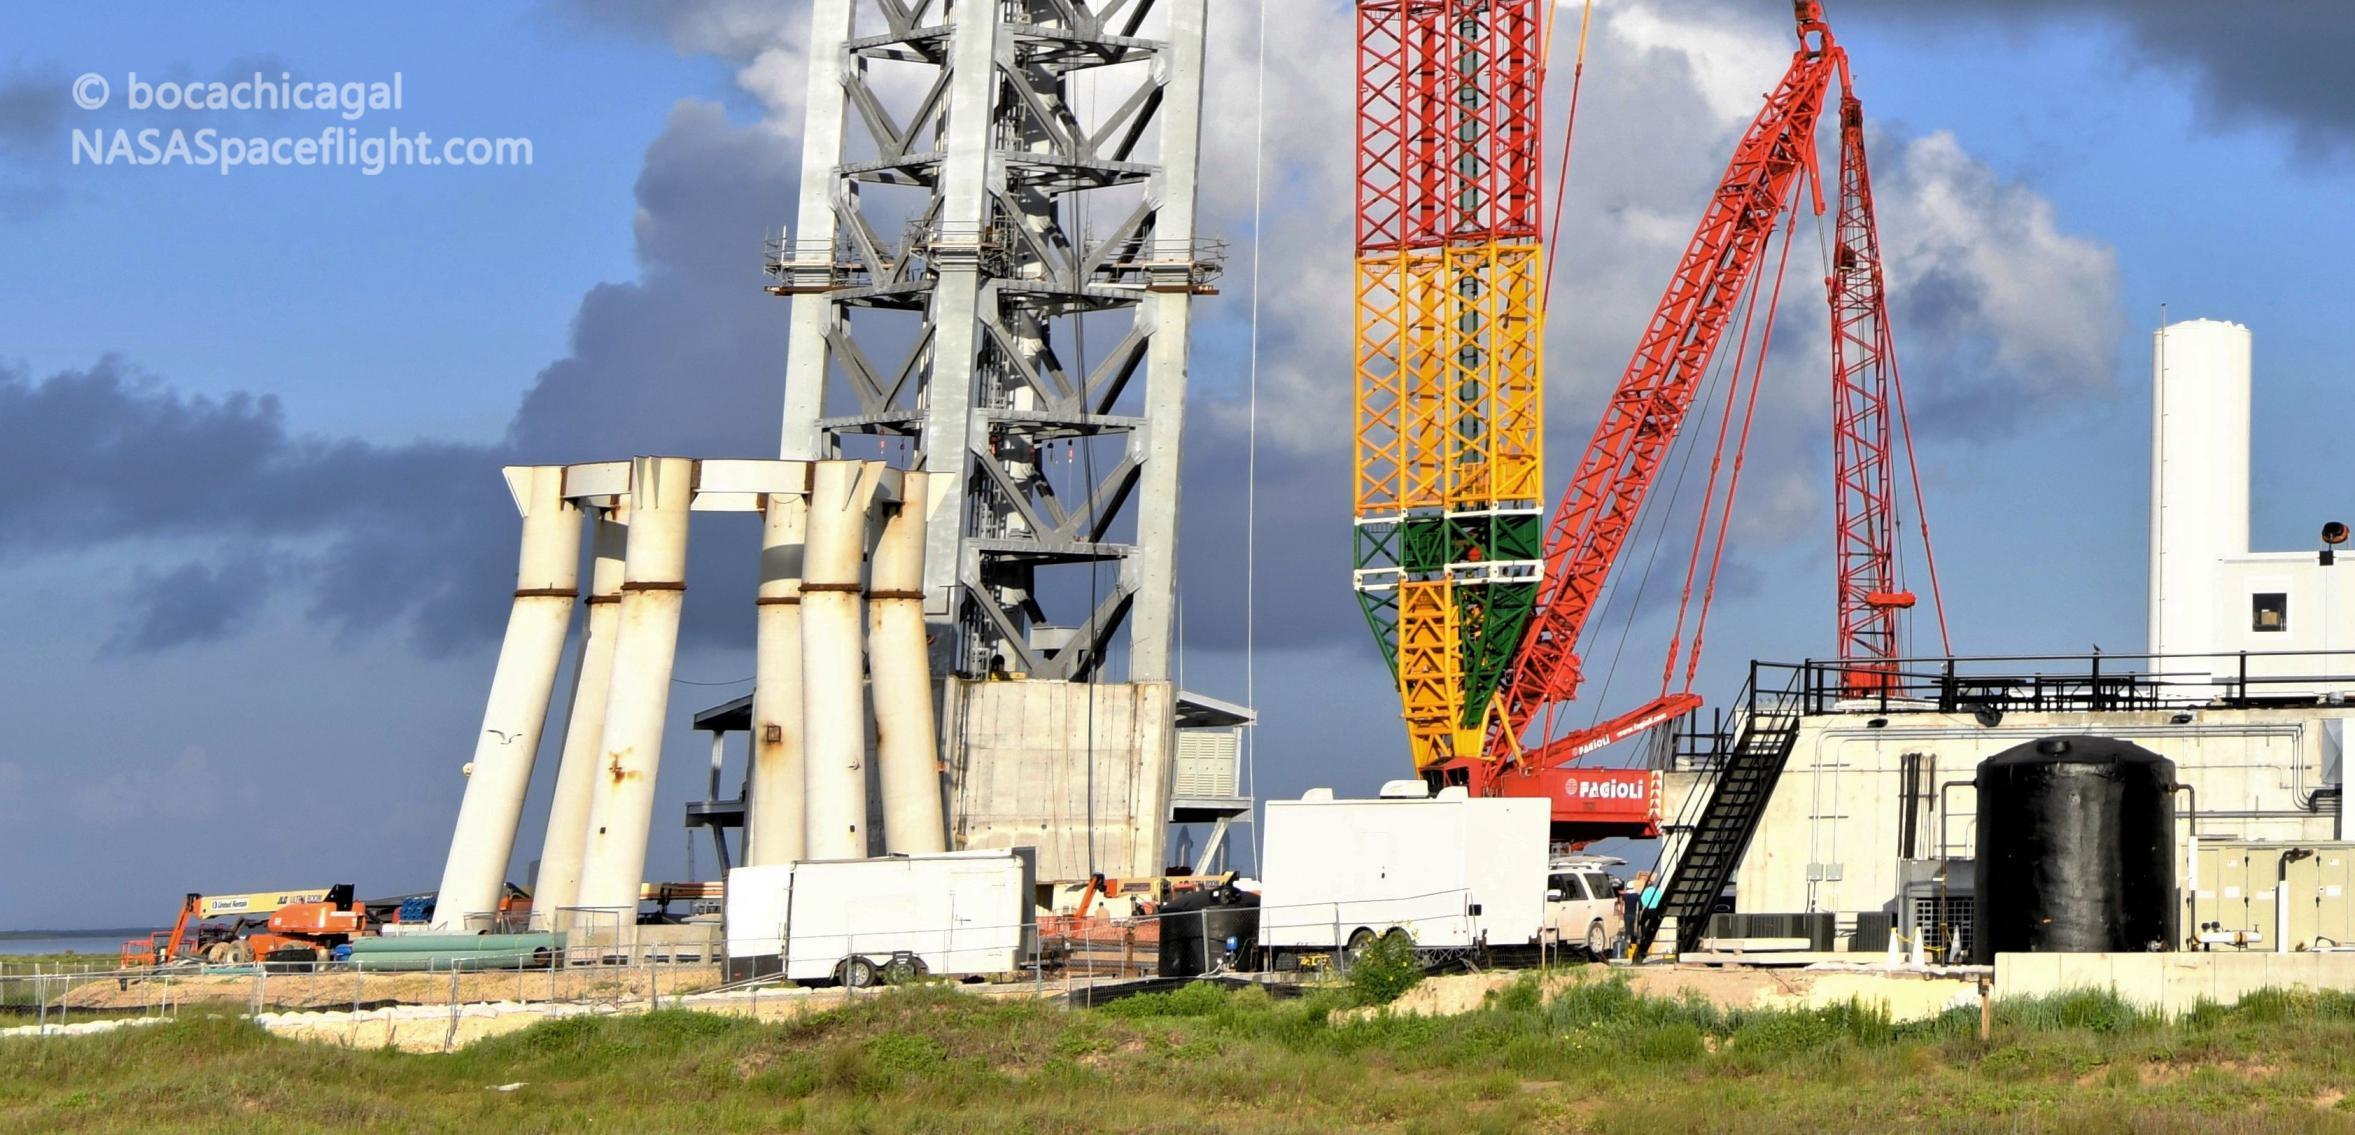 Starship Boca Chica 071921 (NASASpaceflight – bocachicagal) orbital pad crane tower mount GSE 1 crop (c)